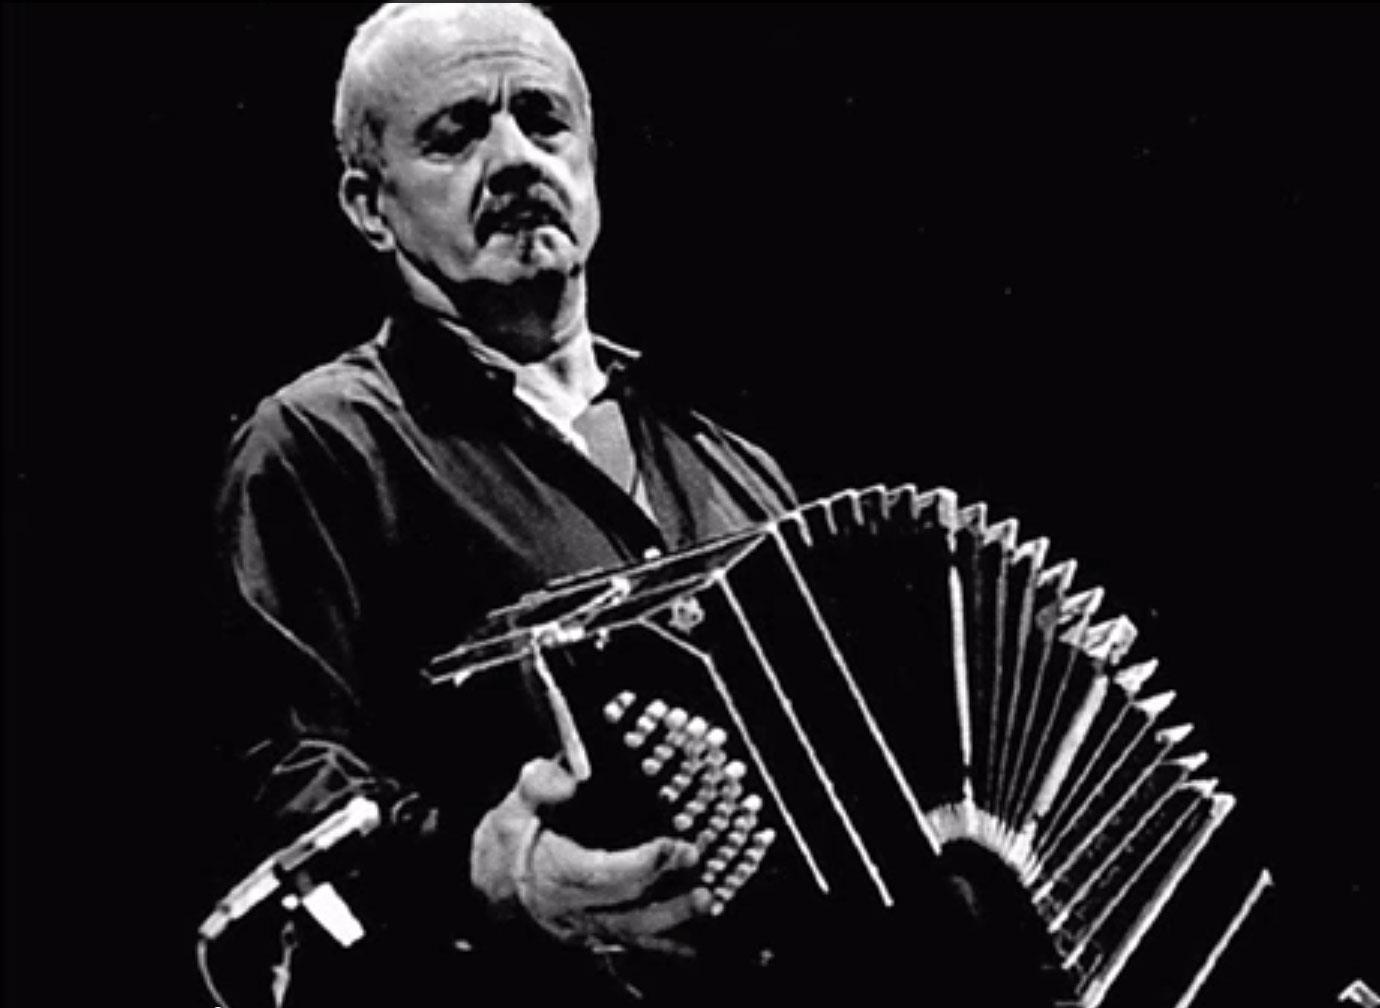 Il video di Astor Piazzolla Libertango